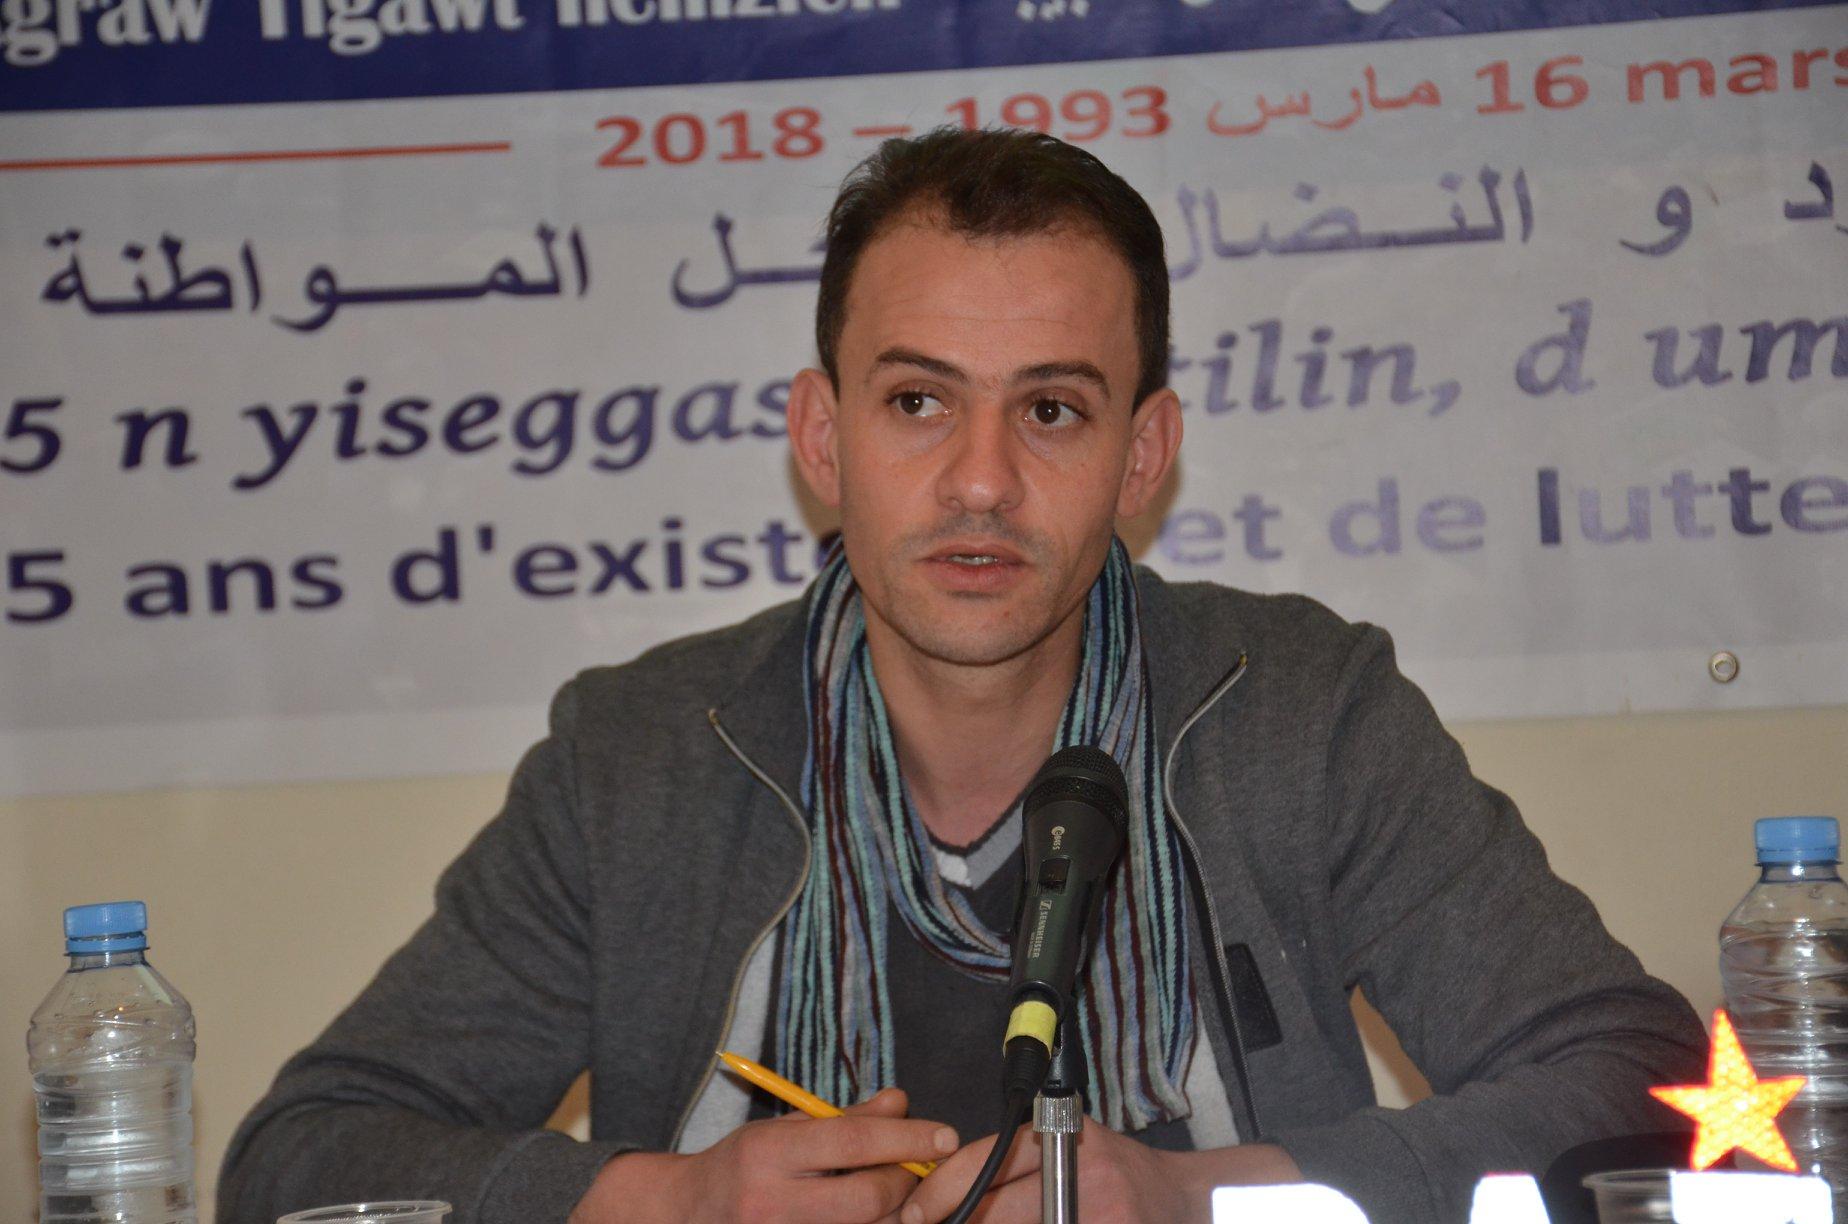 Hamza Hamouchene of the Alliance of Middle Eastern Socialists. Via Facebook